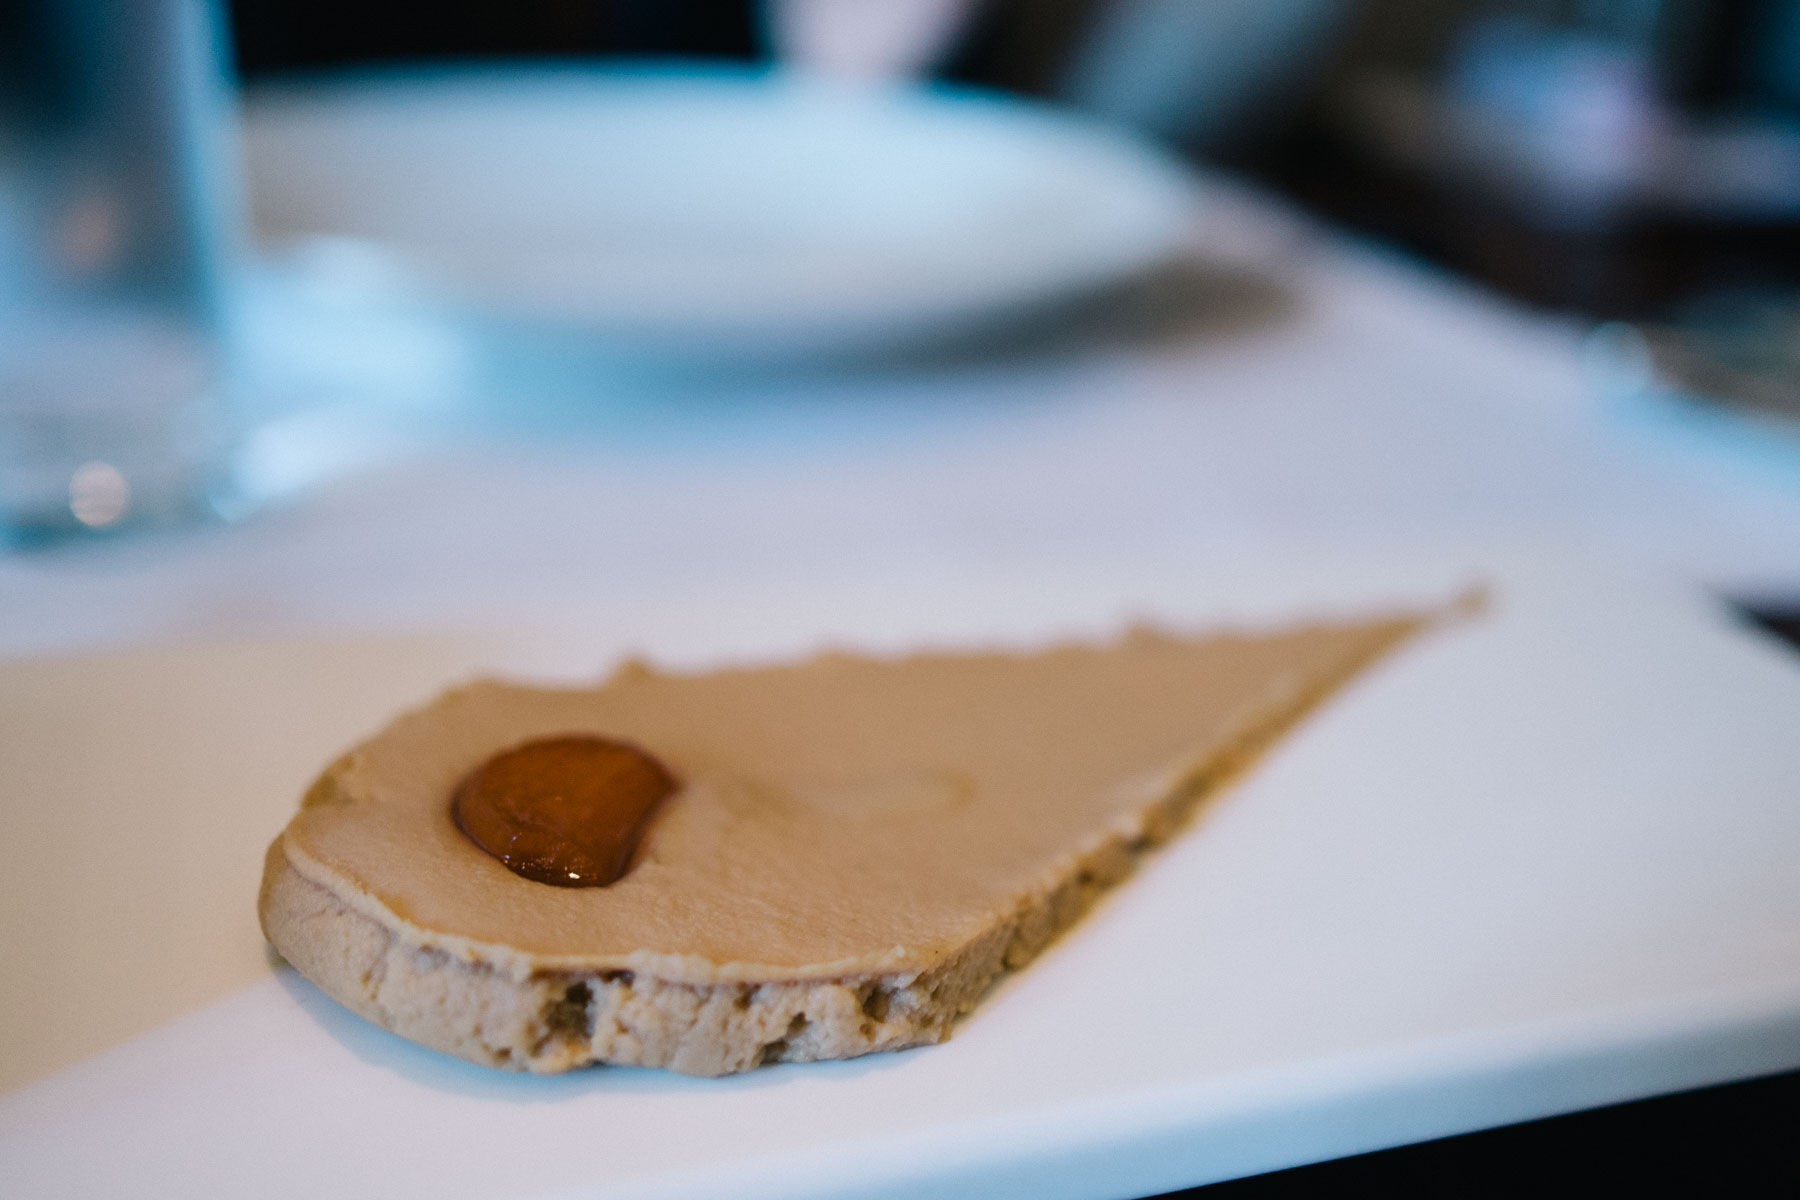 sao-paulo-worlds-best-restaurant-dom-brazil-brasil-michelin-star-2